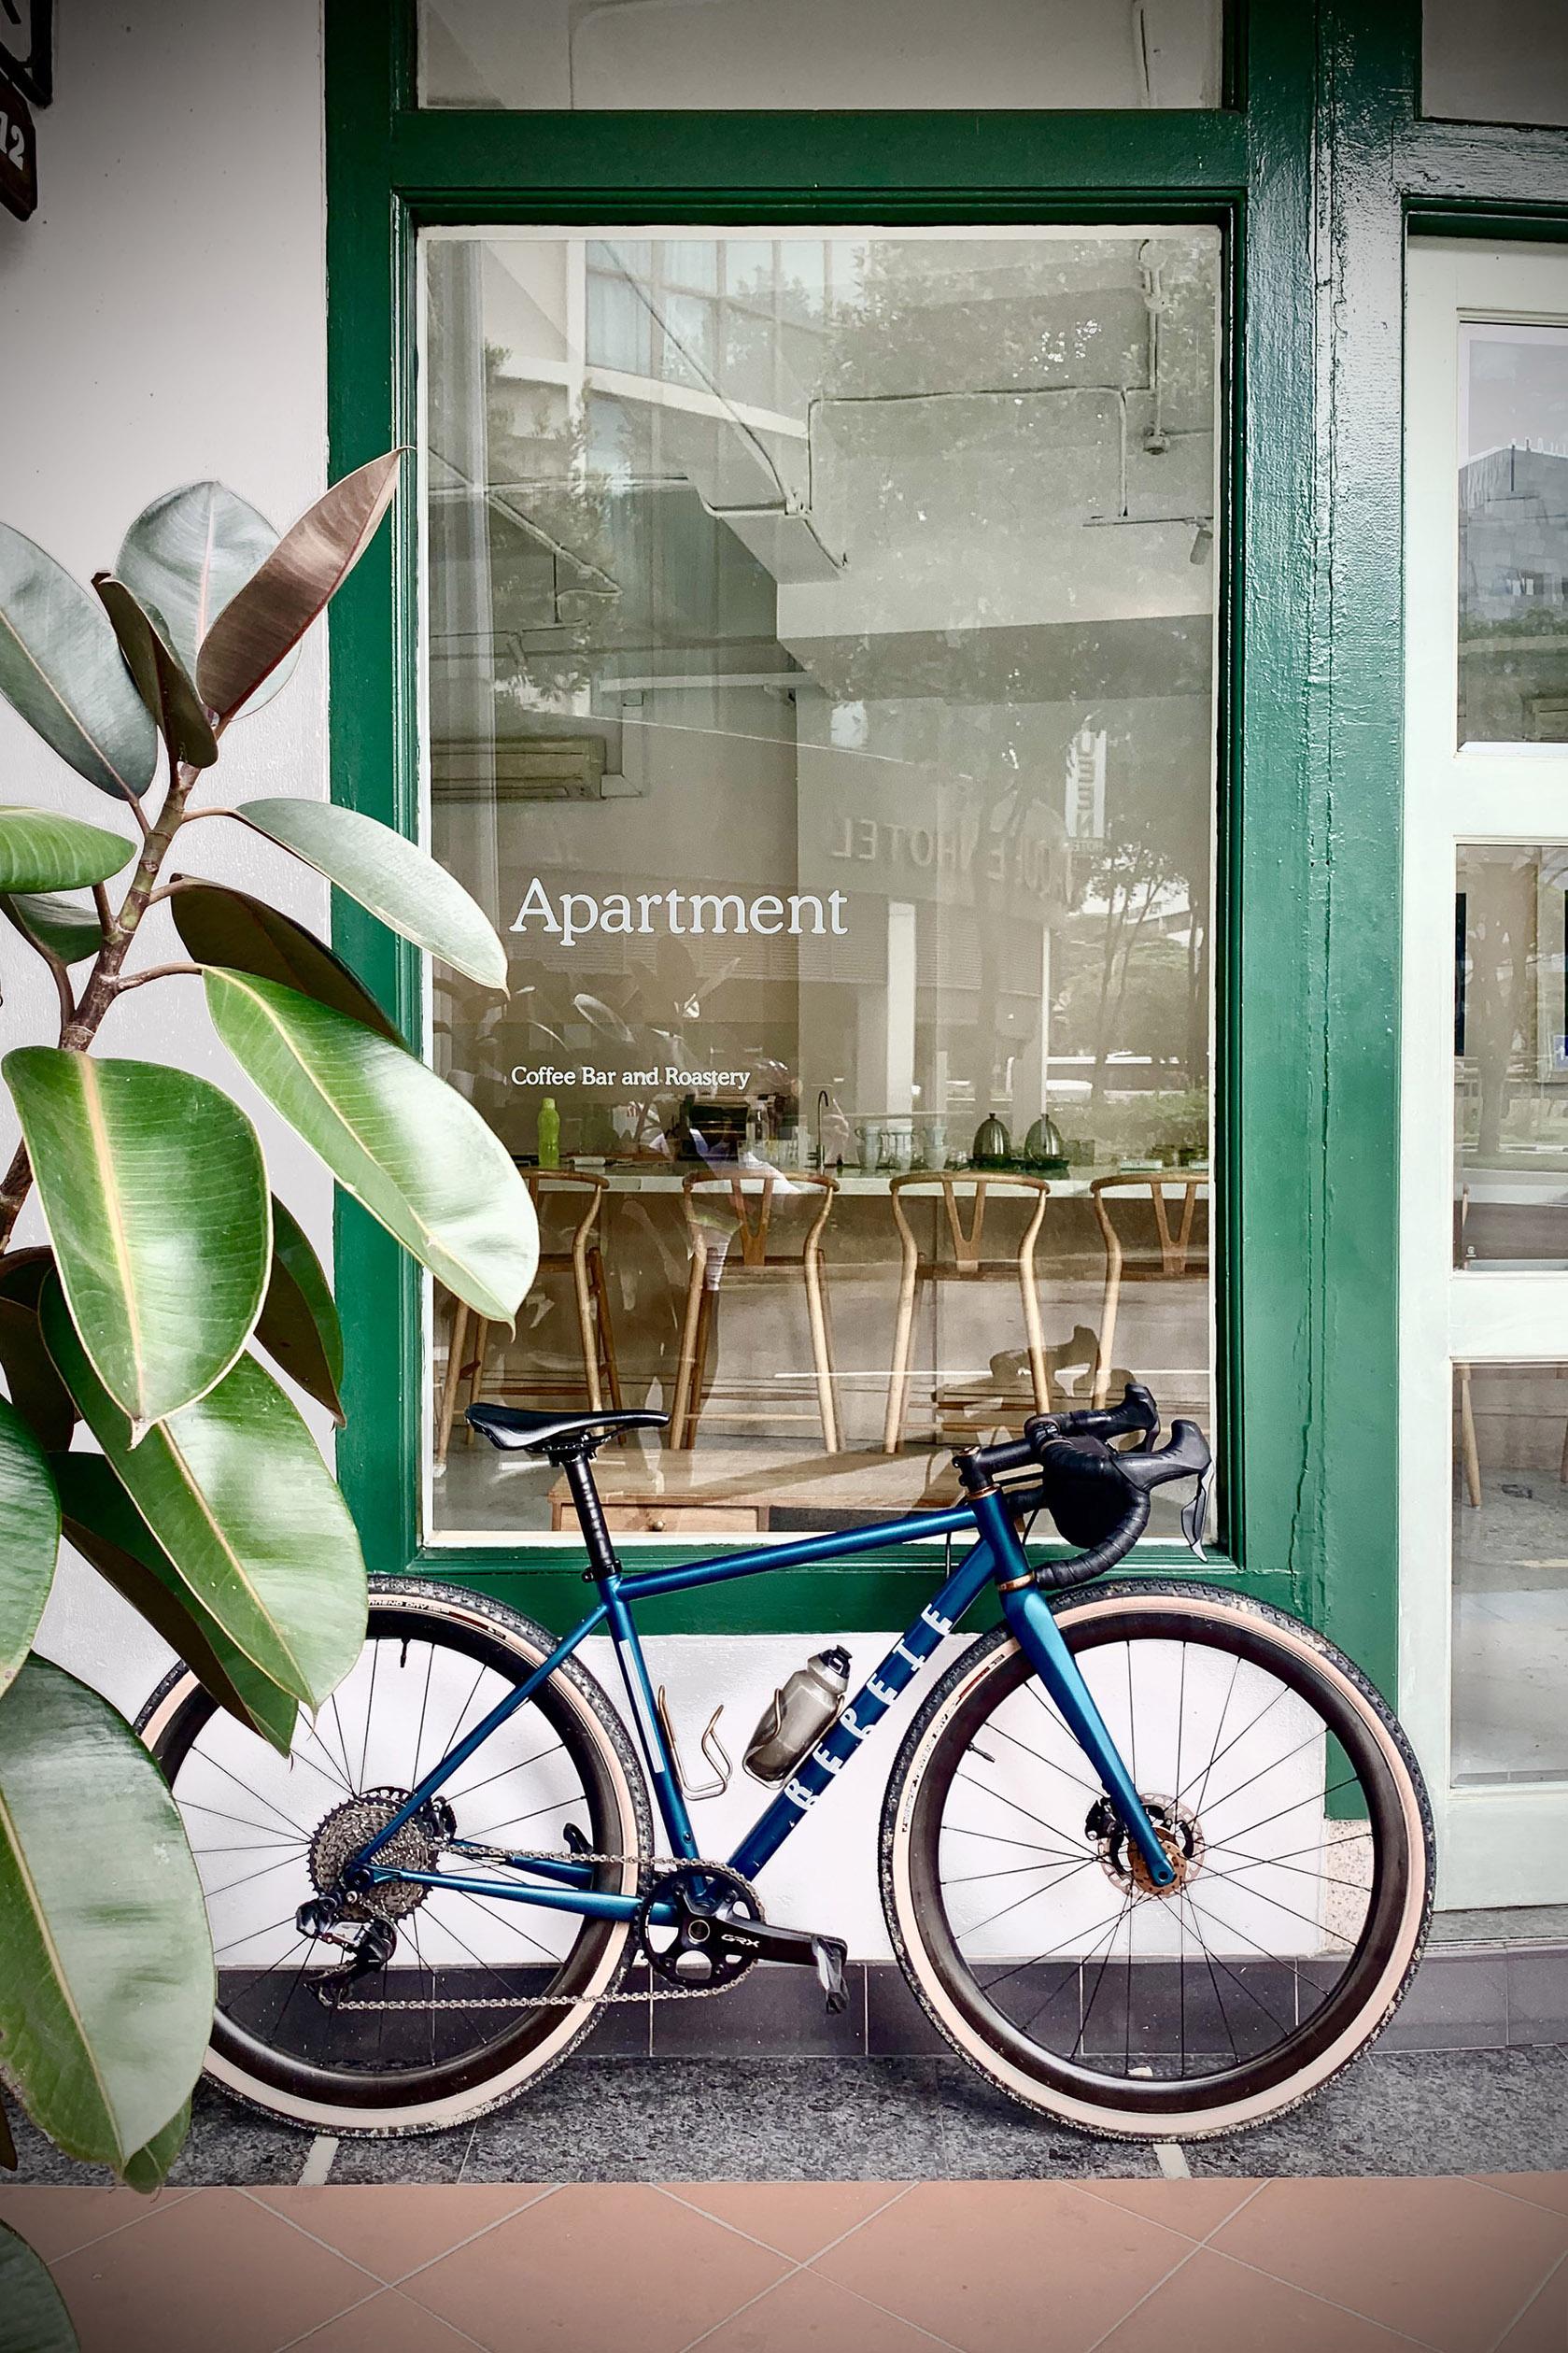 Apartment Coffee Singapore